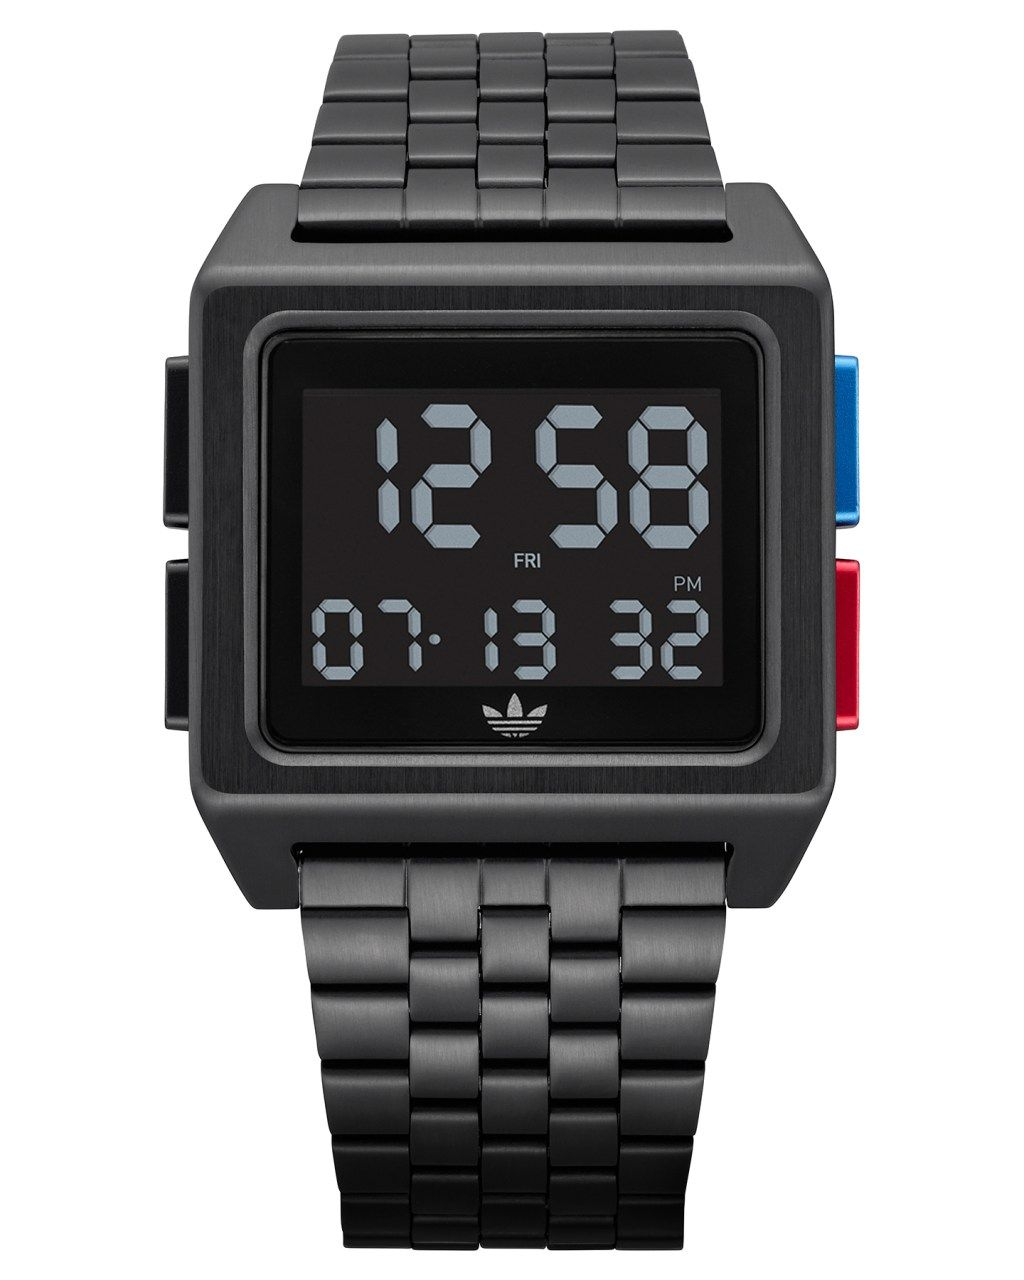 Adidas Watch Buy Adidas Watches For Men & Women Online in